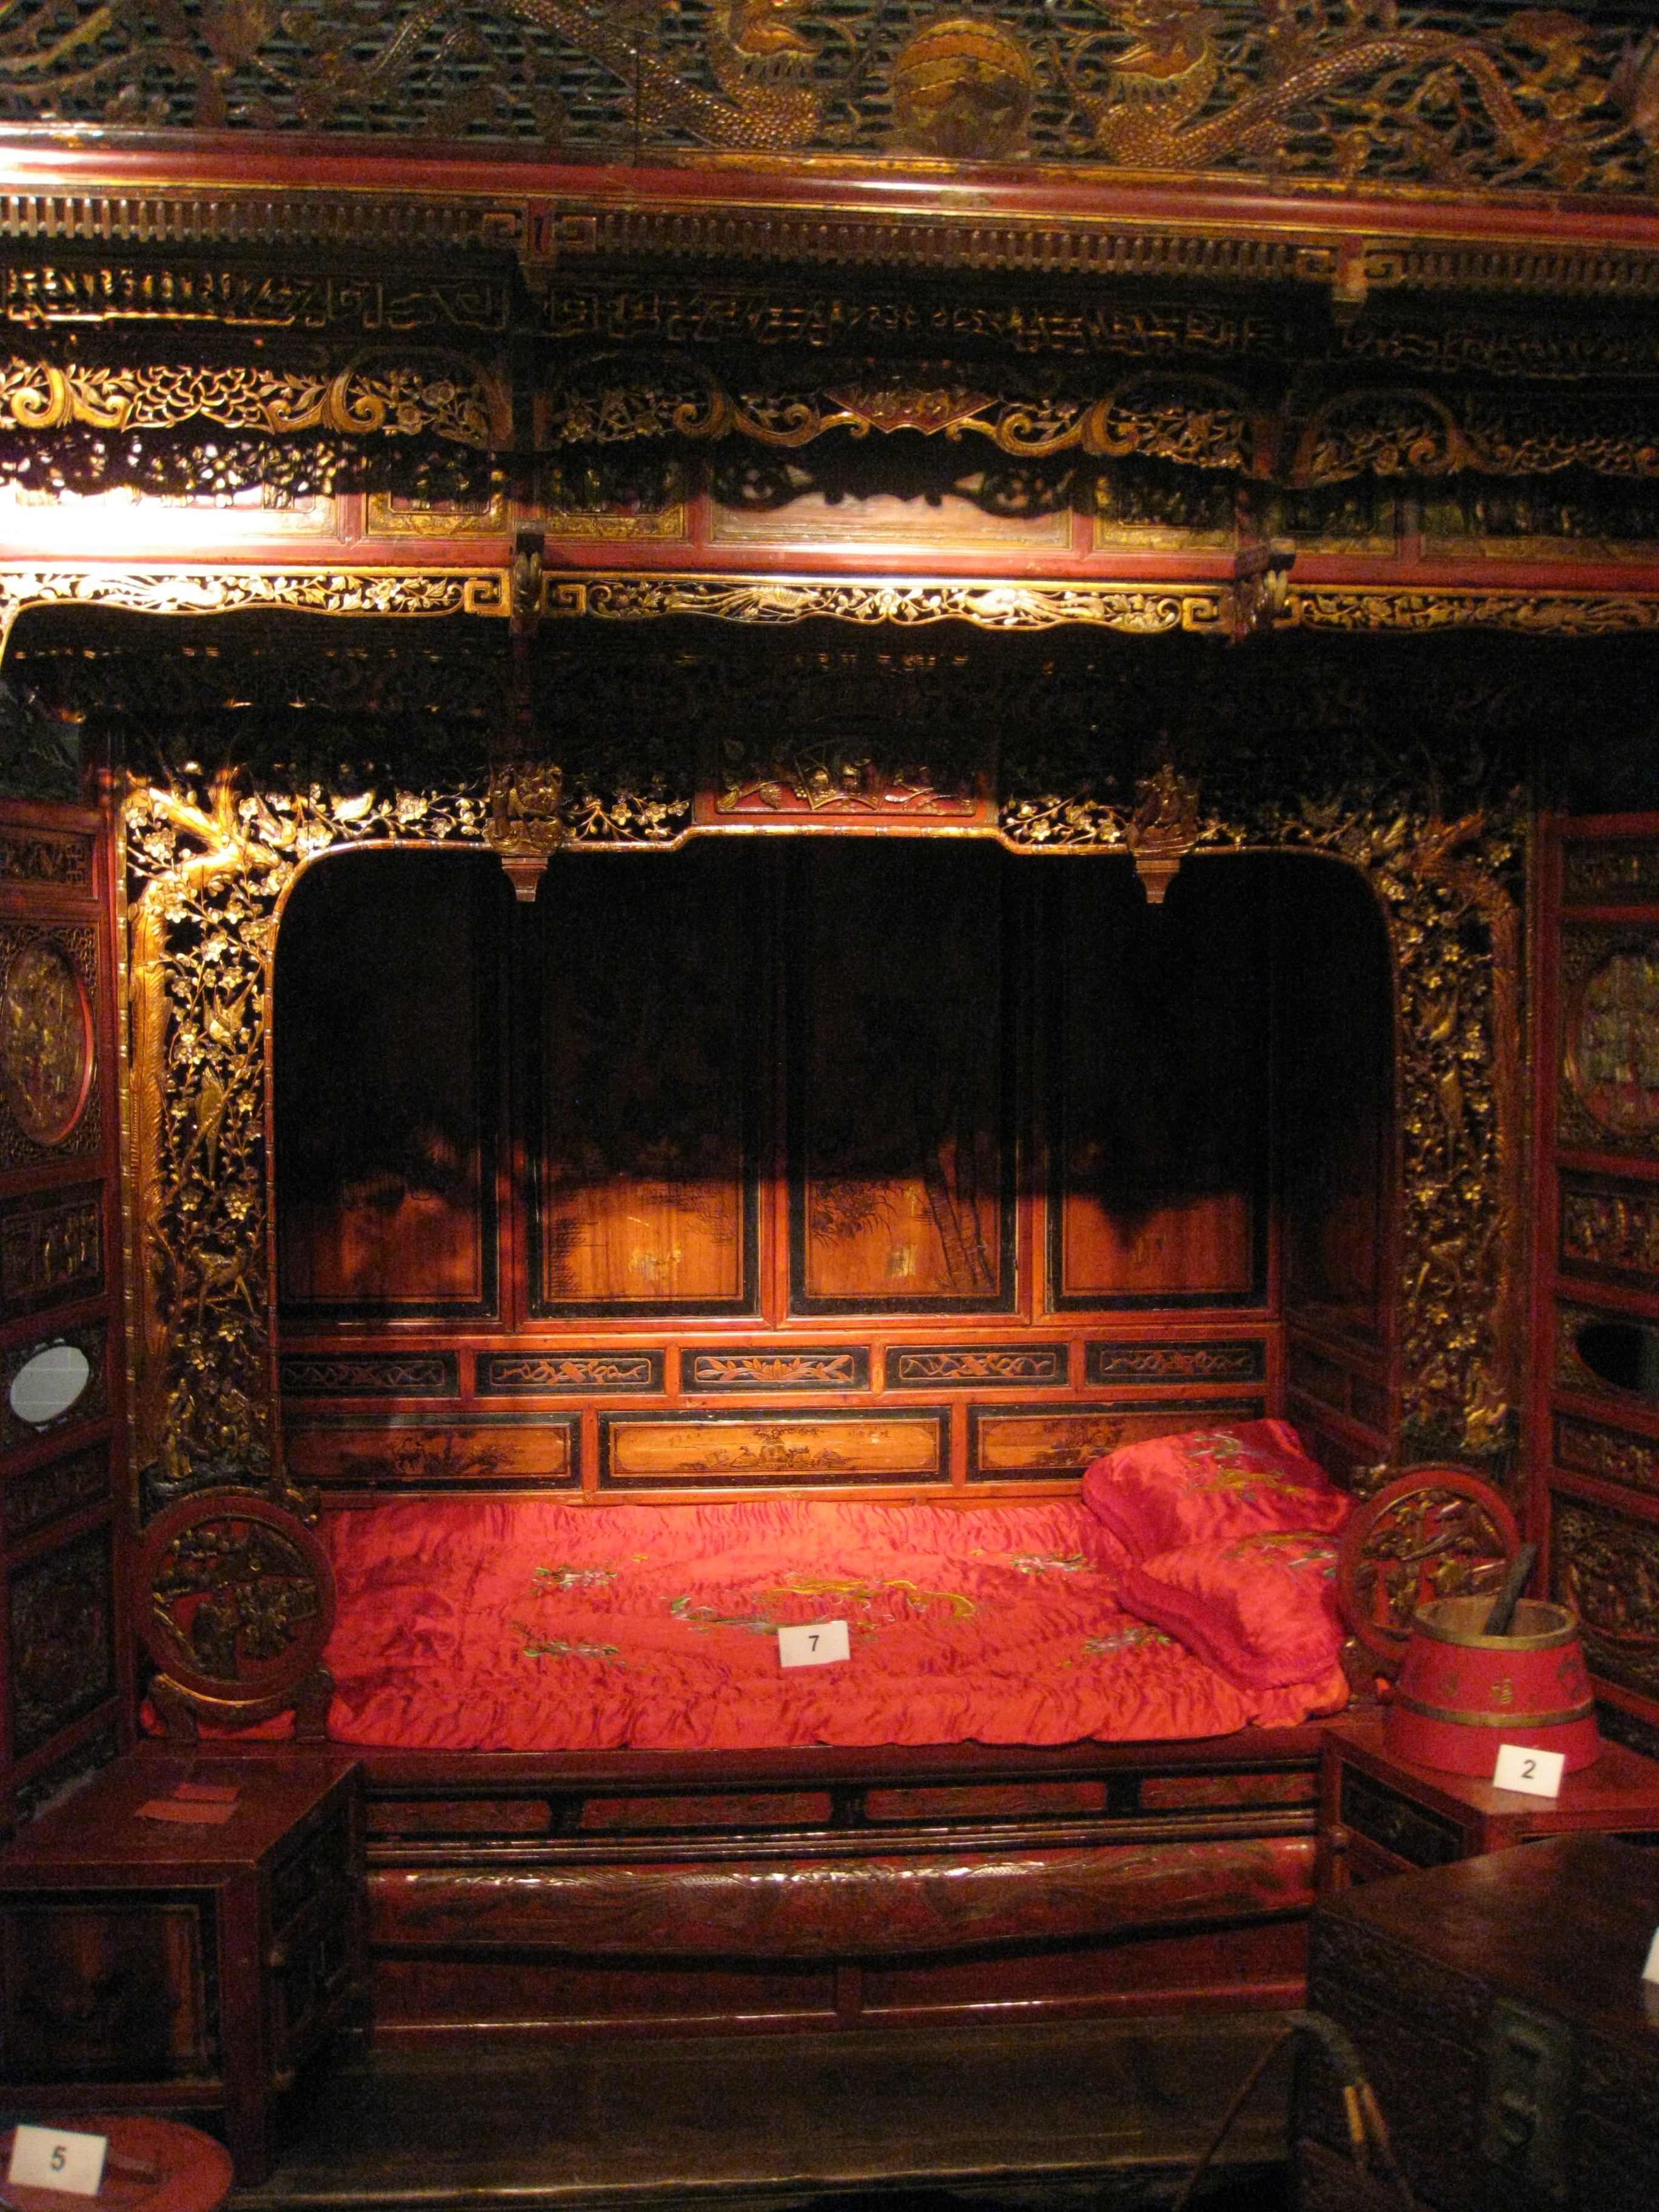 file chinese wedding bed img 5411 jpg wikimedia commons